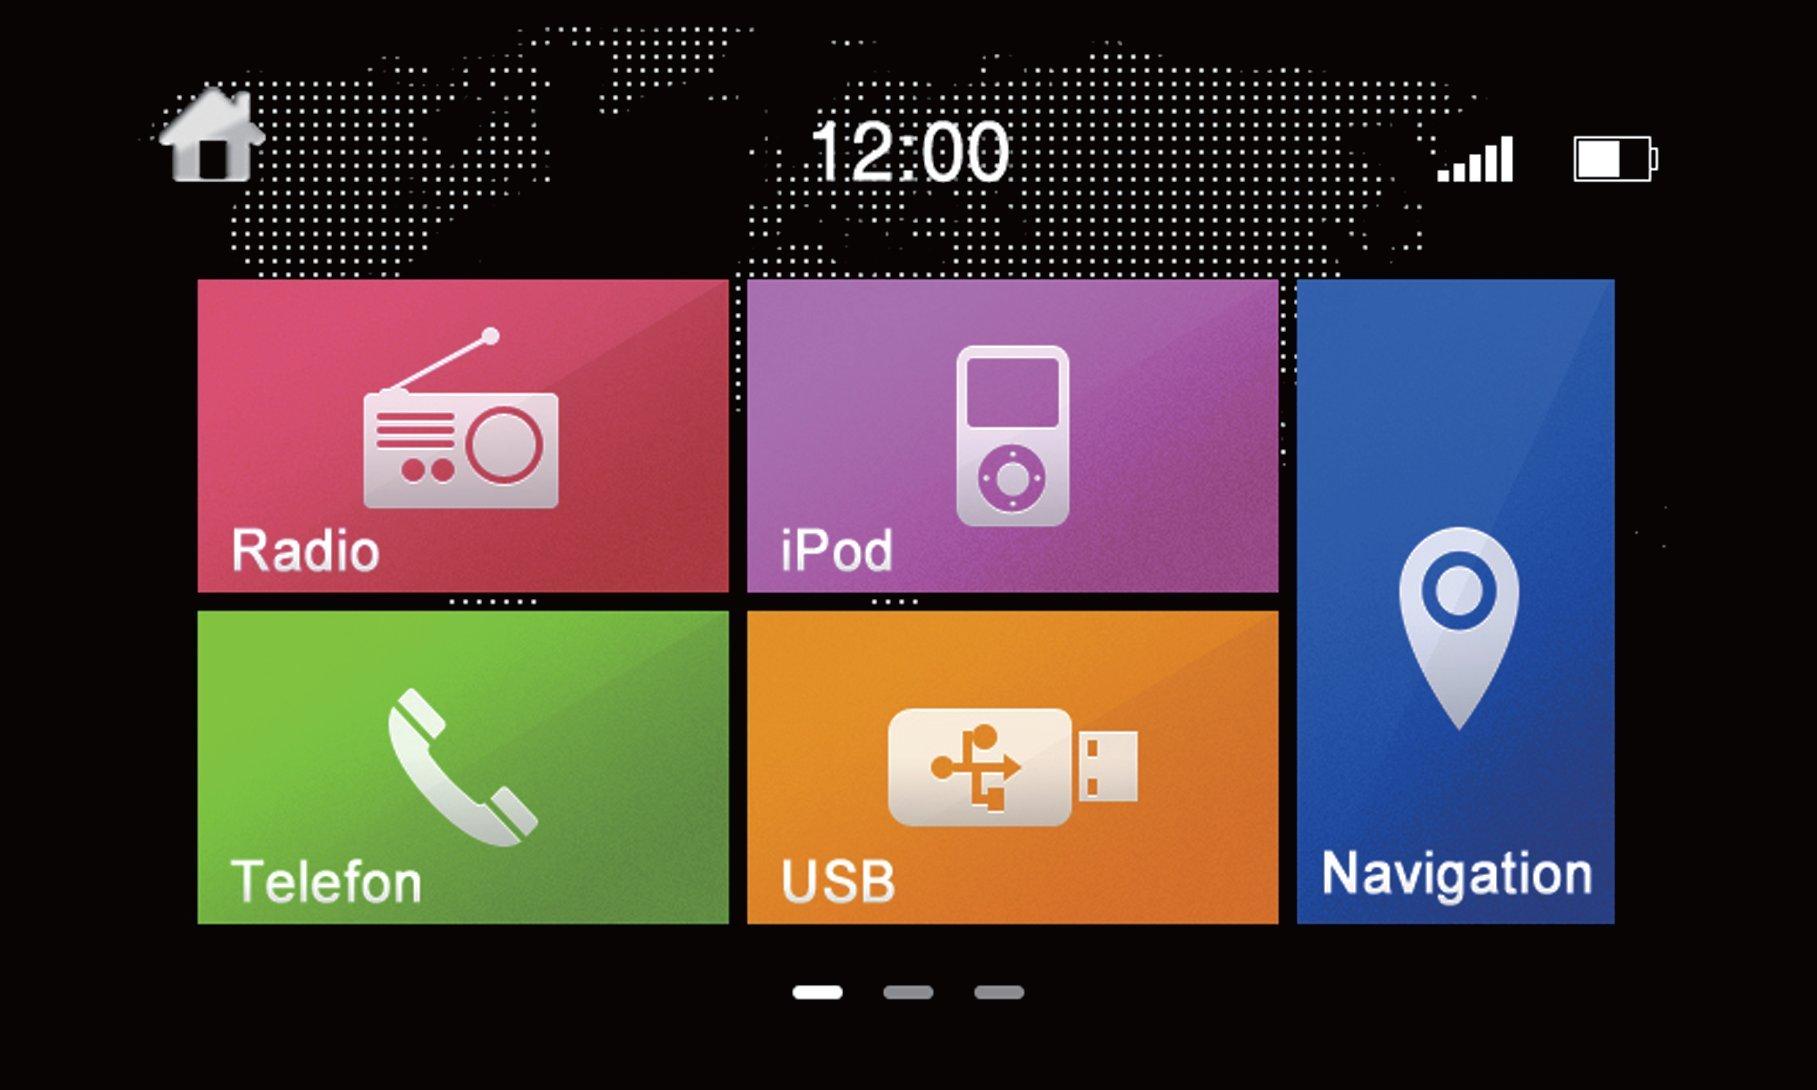 Dynavin-DVN-VW-N6-Navigationsgert-inkl-Navigationssoftware